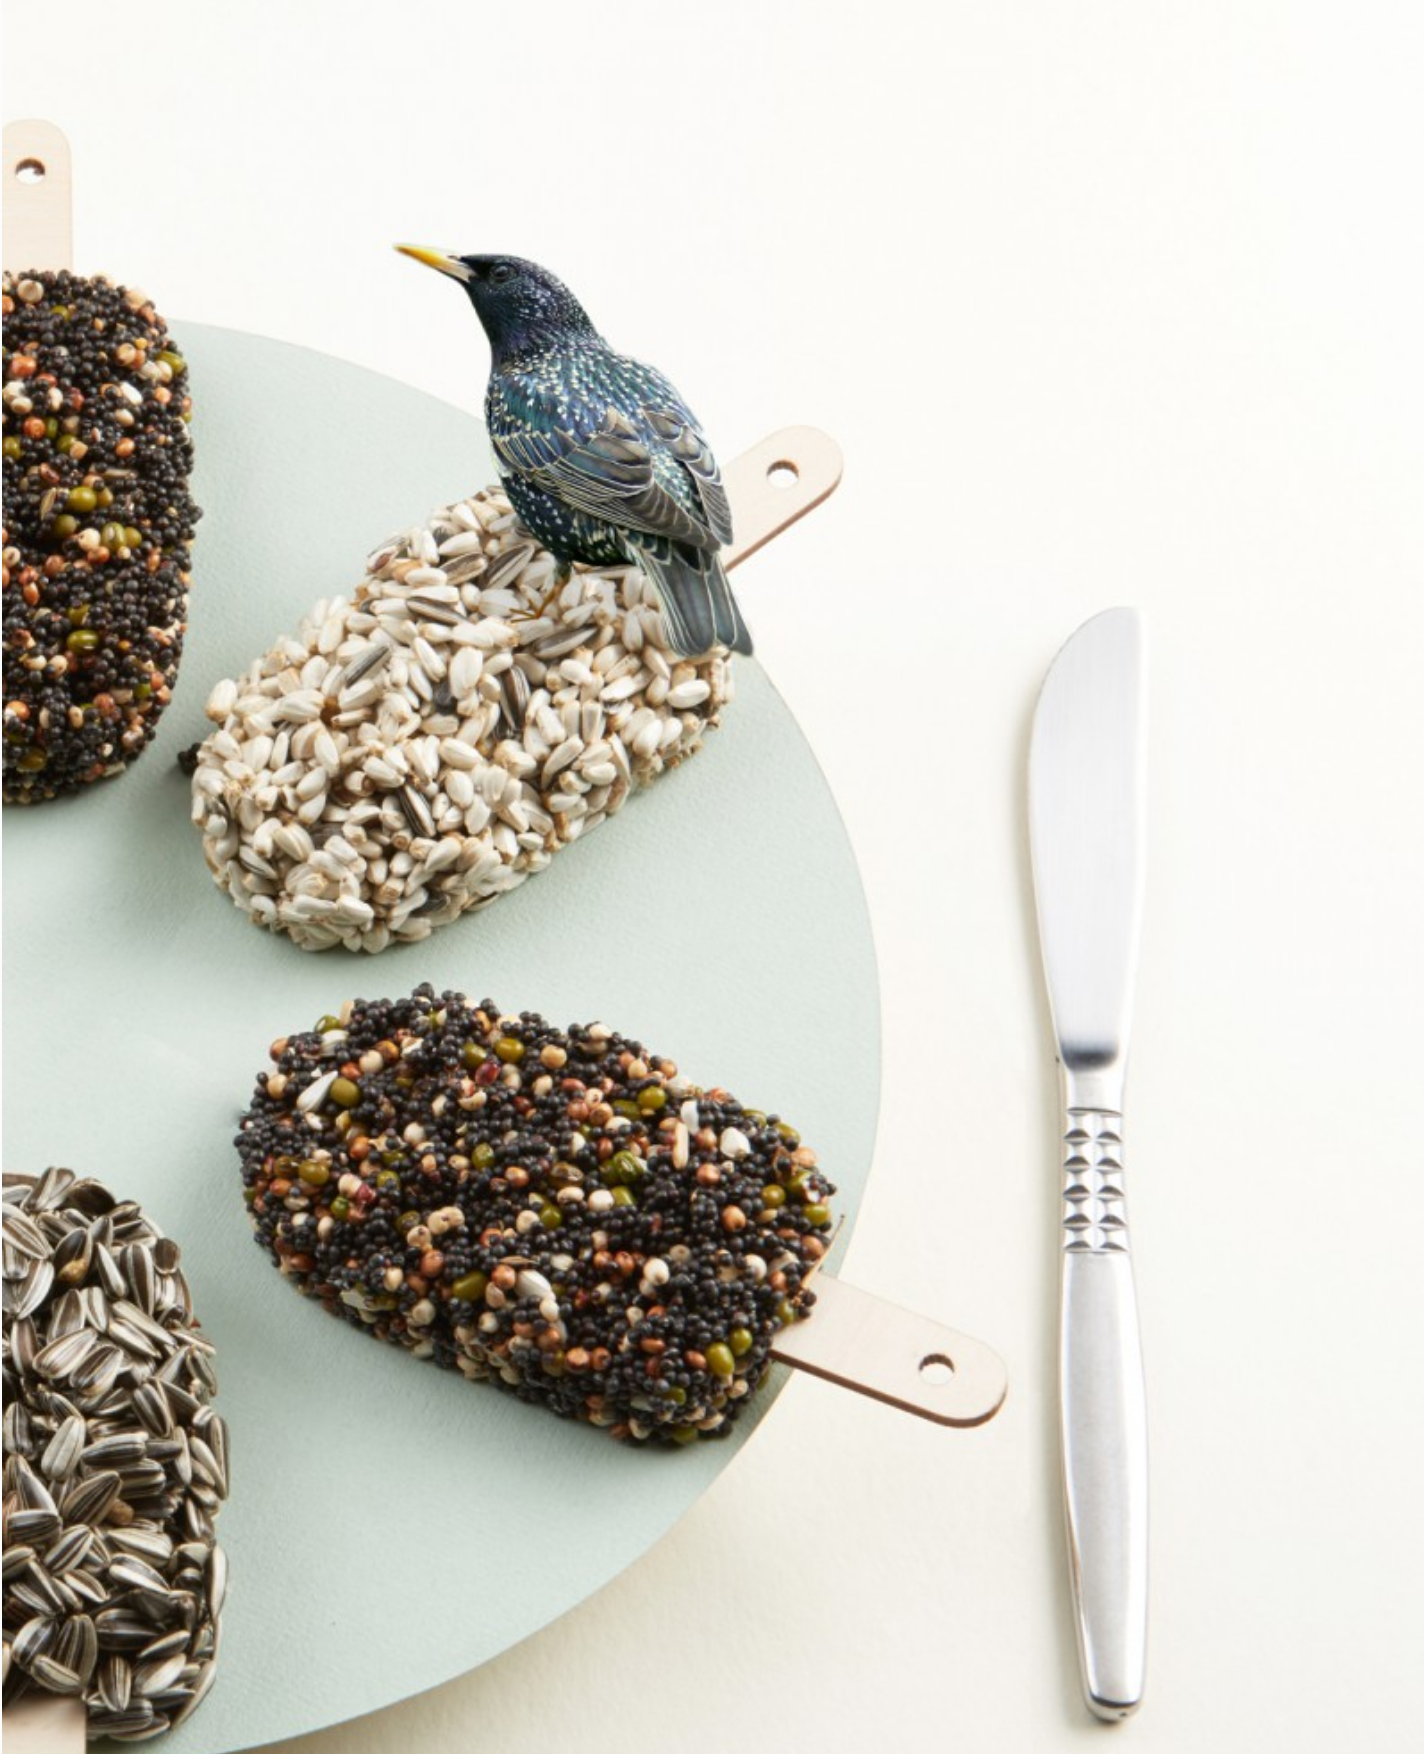 Desserts For Birds Crunchy Crunchy-4